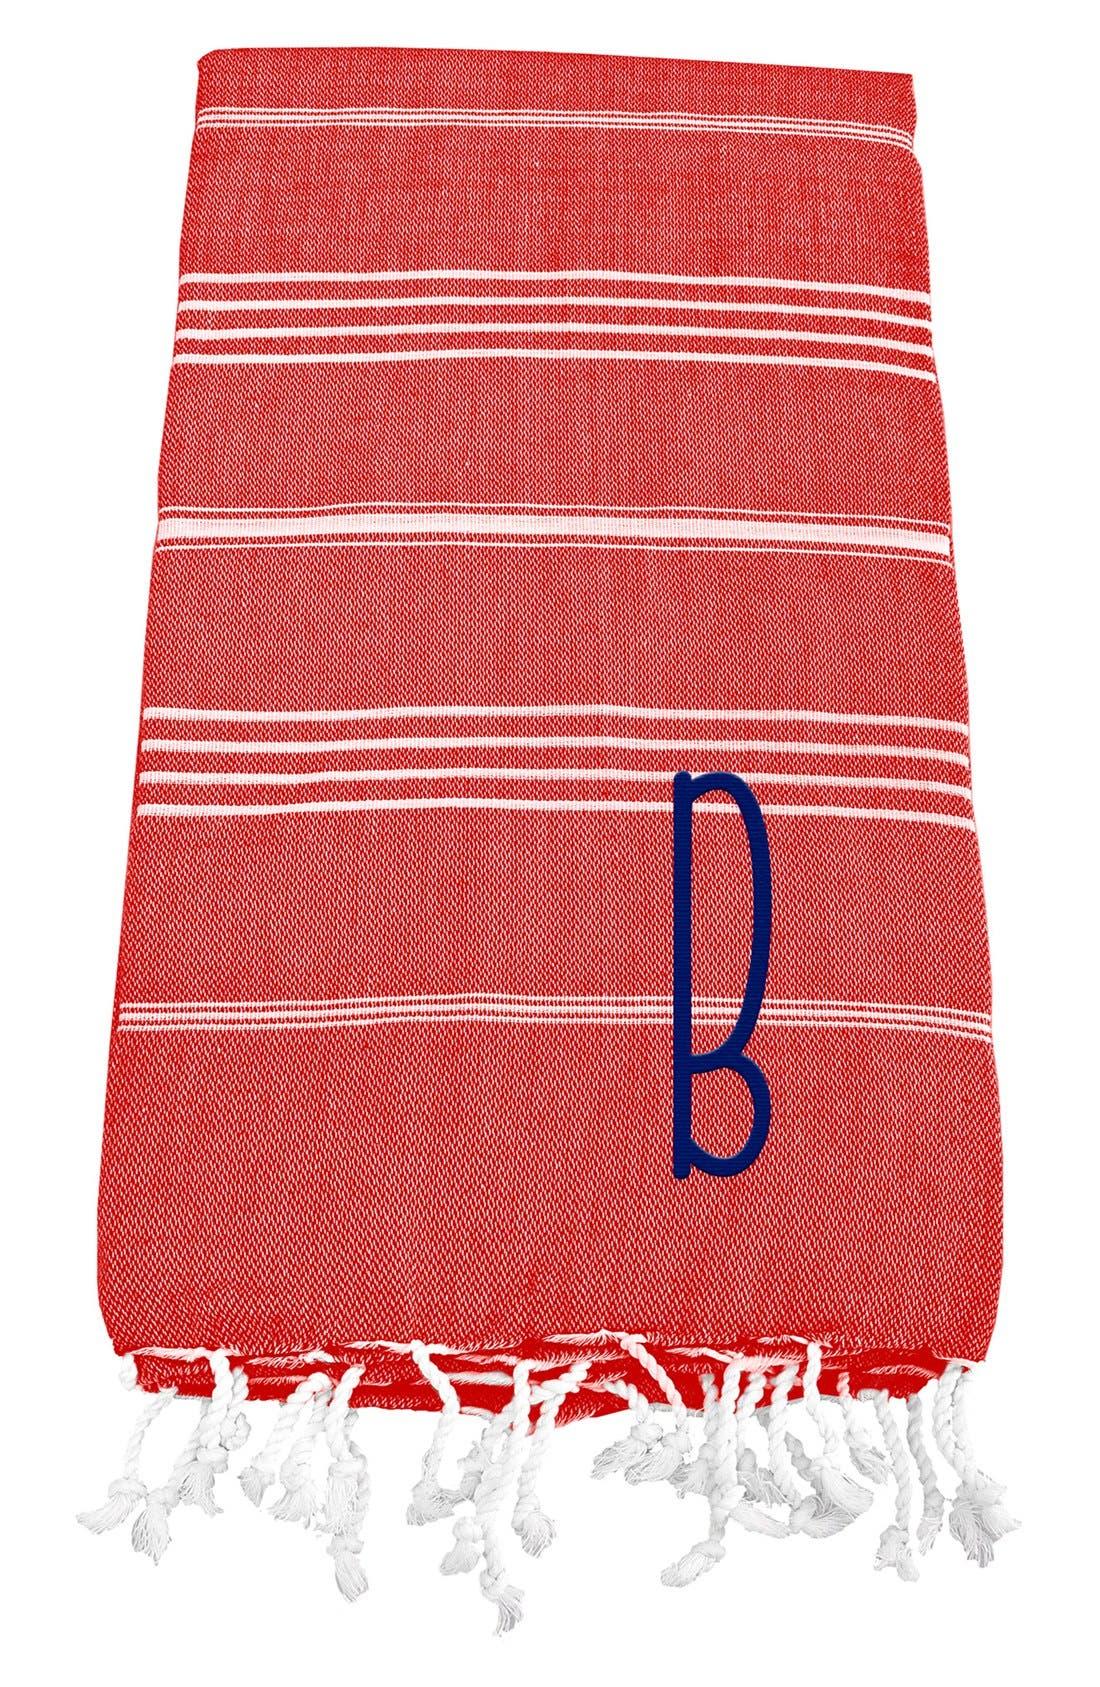 Monogram Turkish Cotton Towel,                             Main thumbnail 111, color,